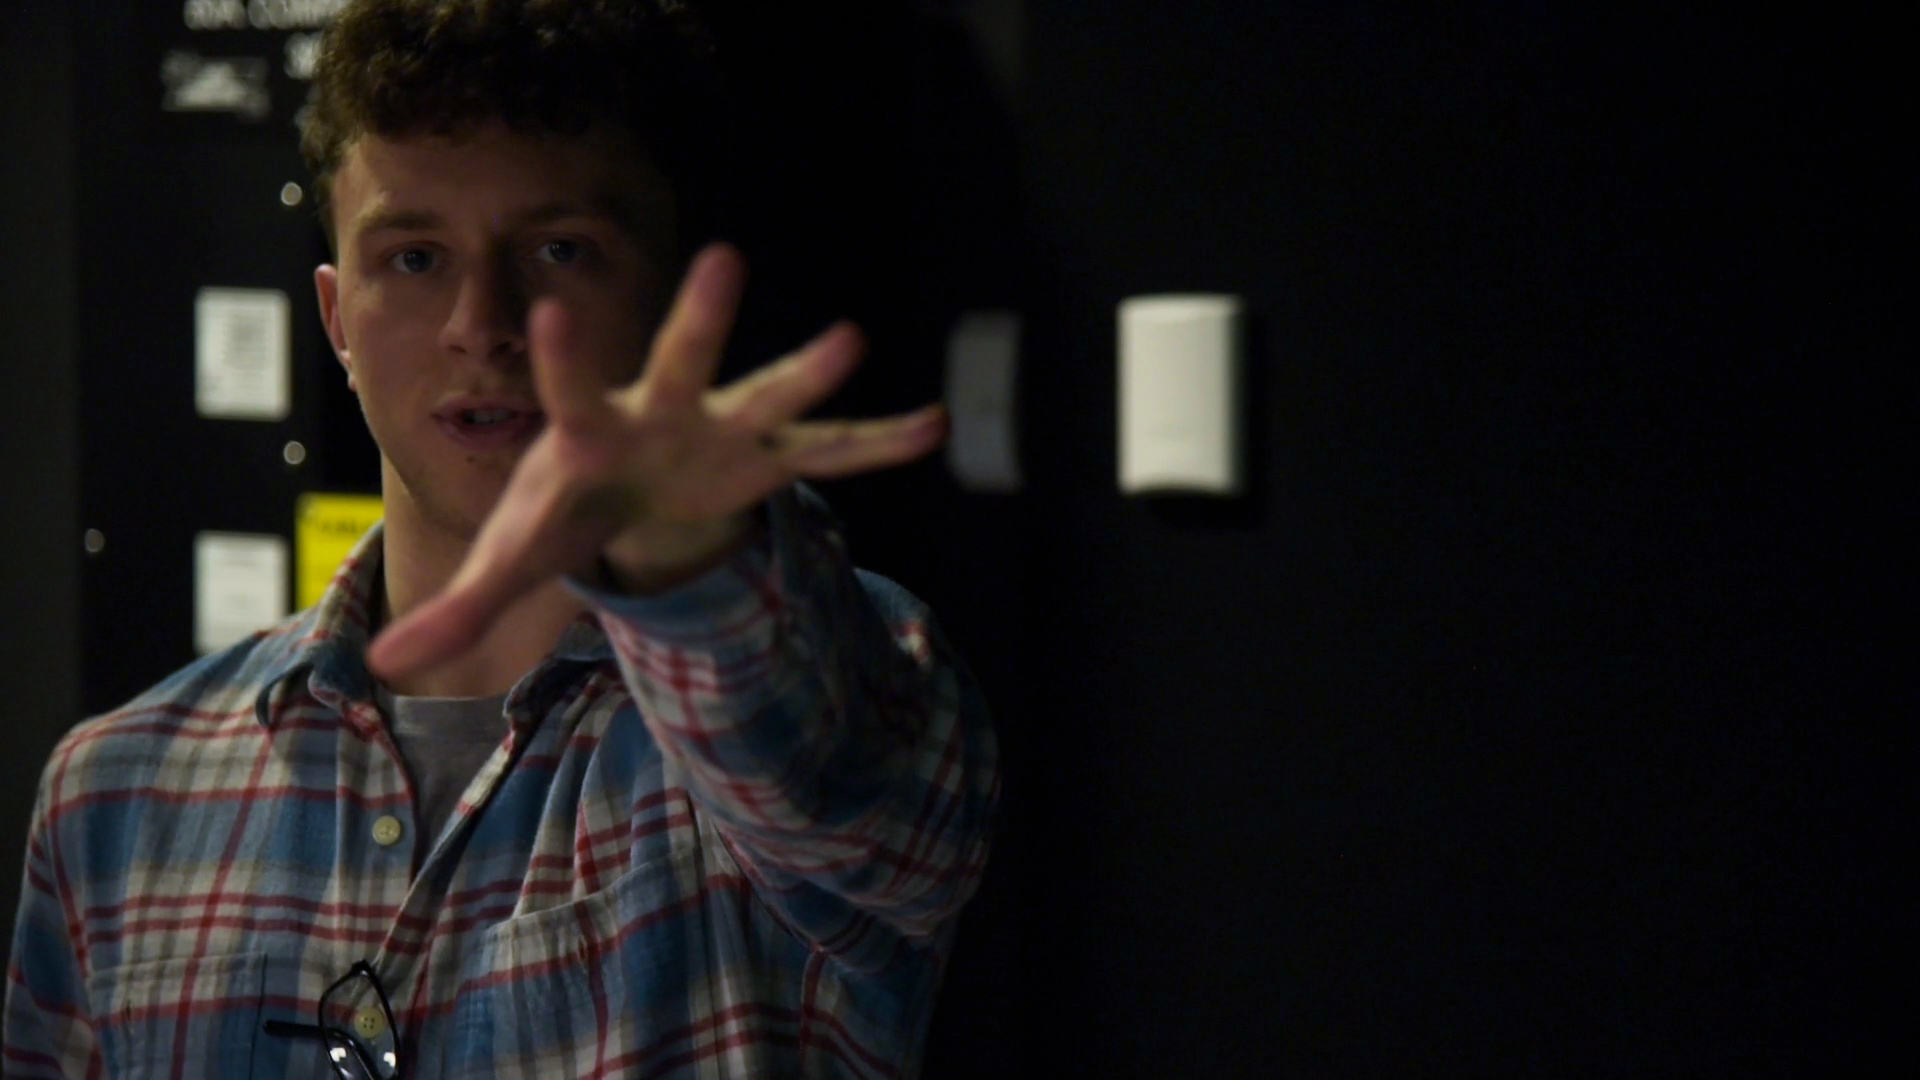 Gabriel Stuart behind the scenes on the set of Geena Matuson's (@geenamatuson) film shoot, 2019. Cinematography by Matthew DeVirgilio. See more @ geenamatuson.com.